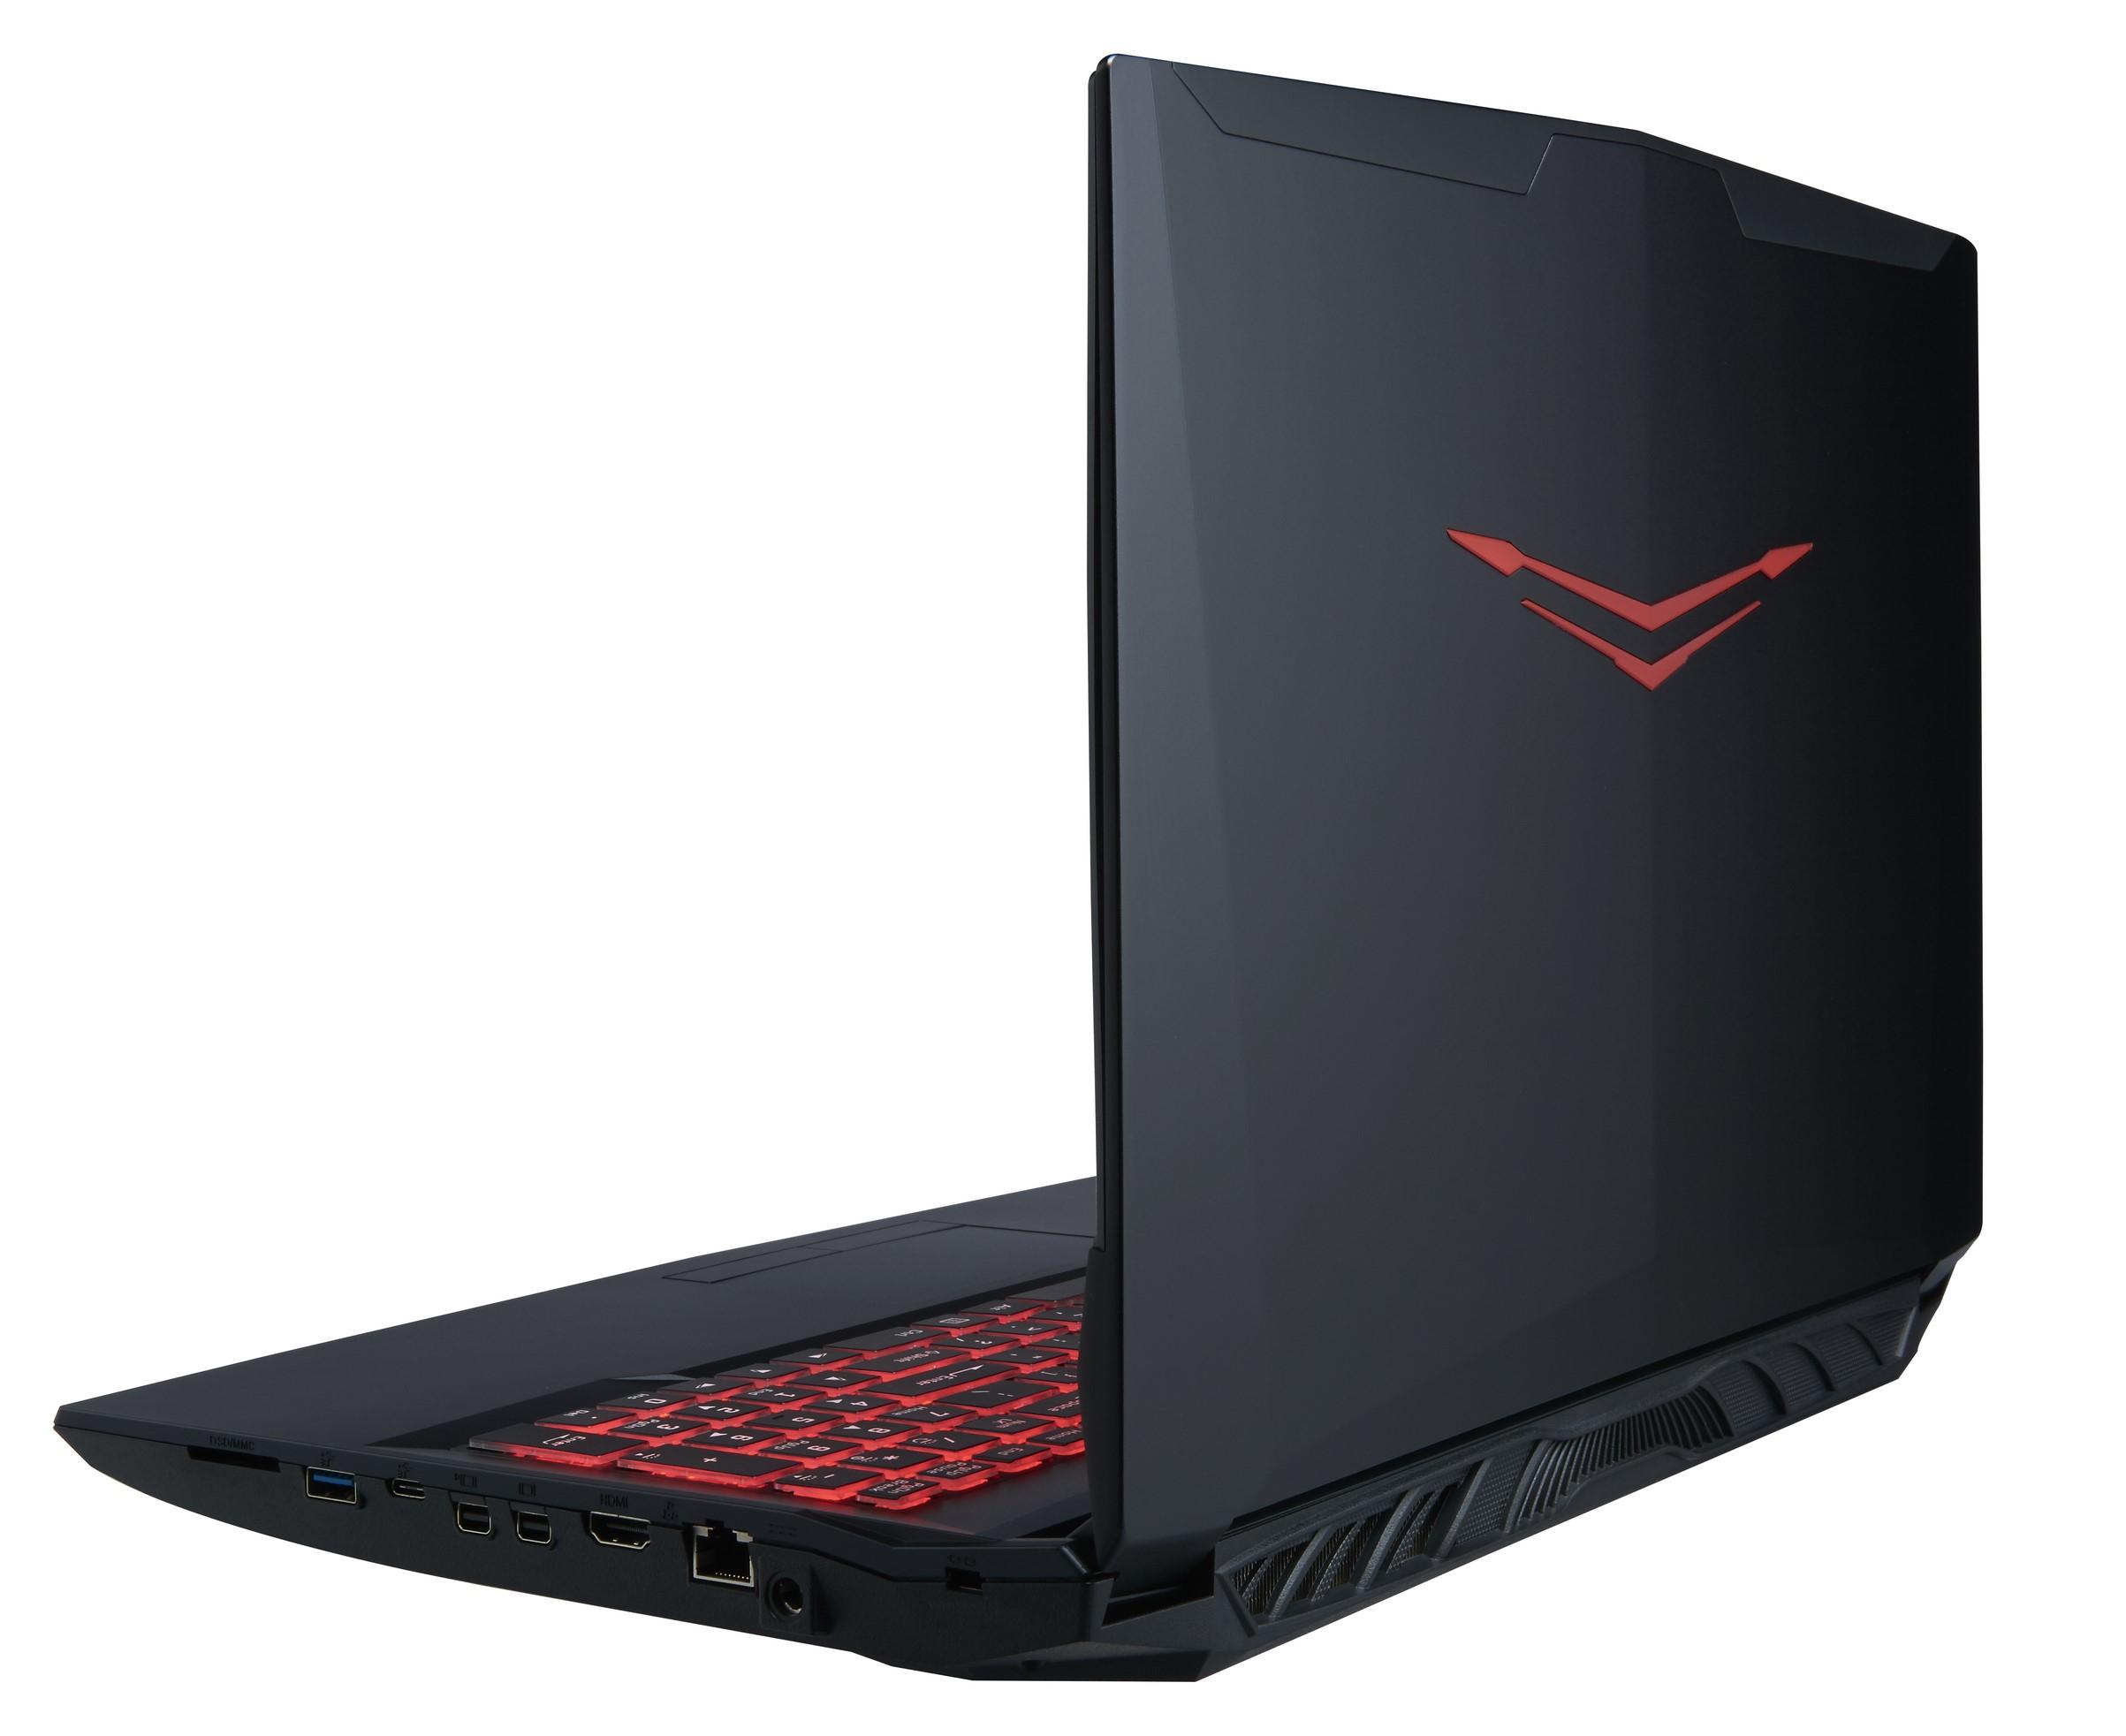 CLEVO N957TP6 Desktop CPU Laptop | NVIDIA GTX 1060